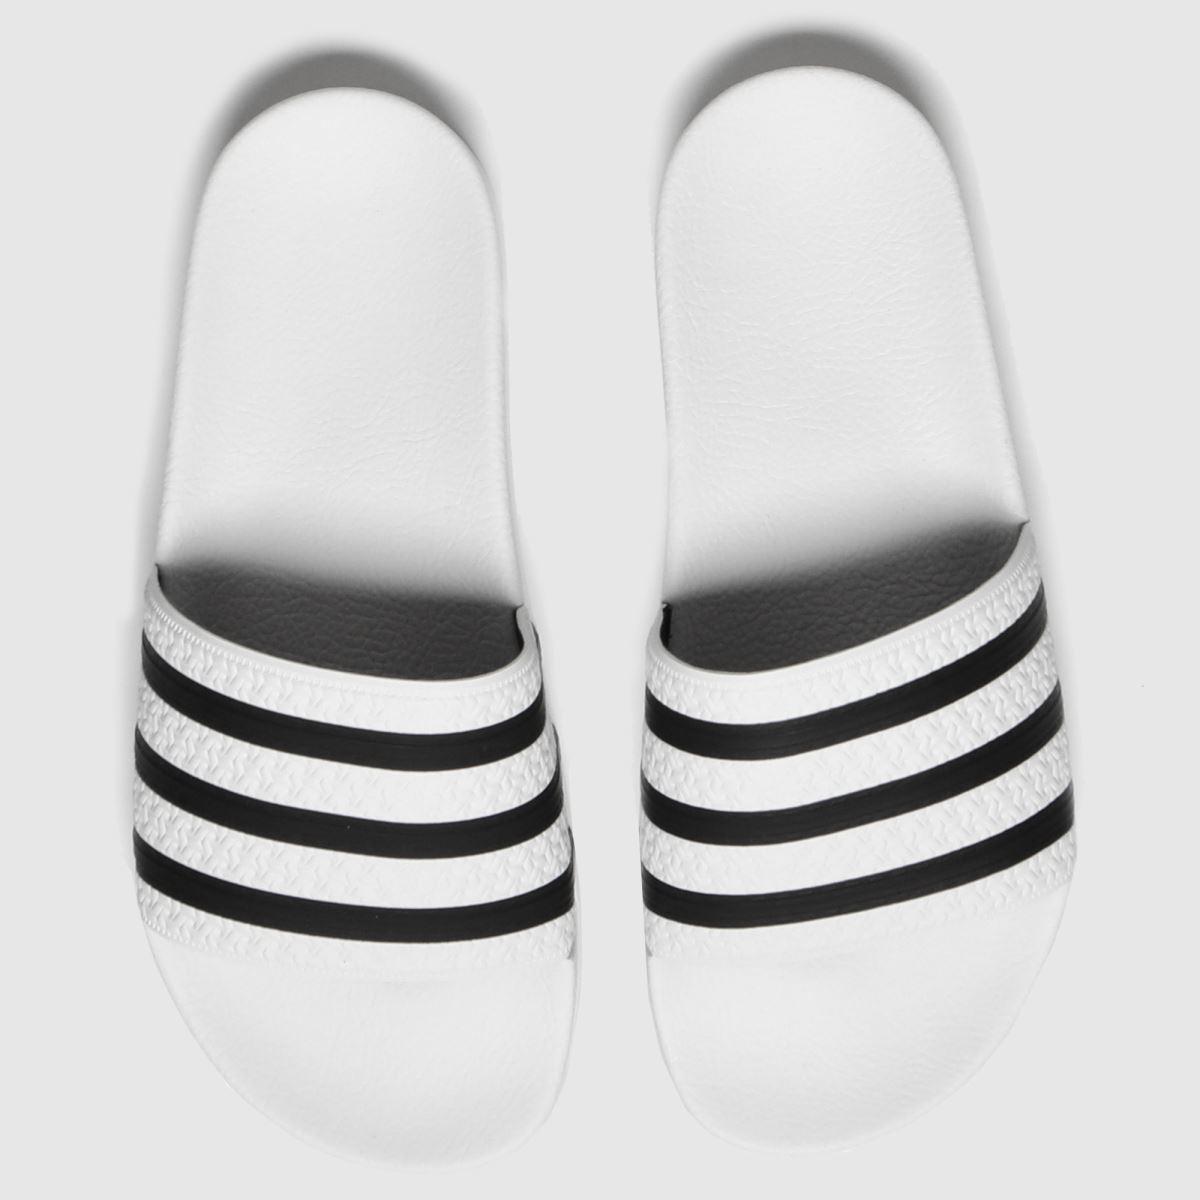 Adidas White & Black Adi Adilette Sandals